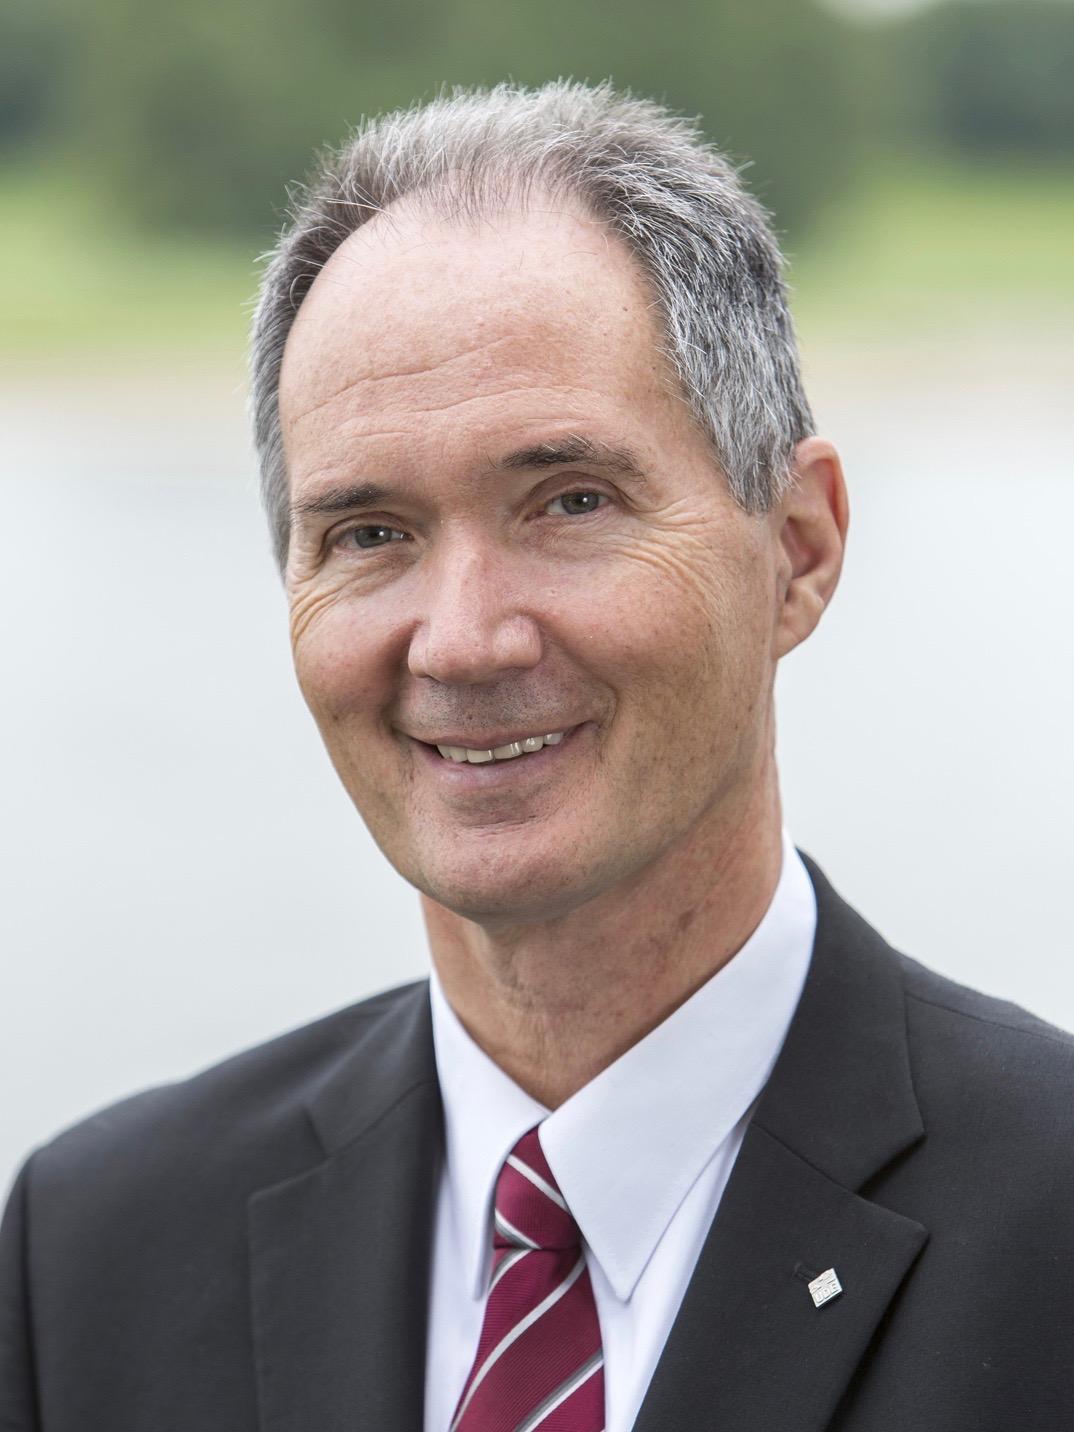 Univ.-Prof. Dr. Ulrich Radtke